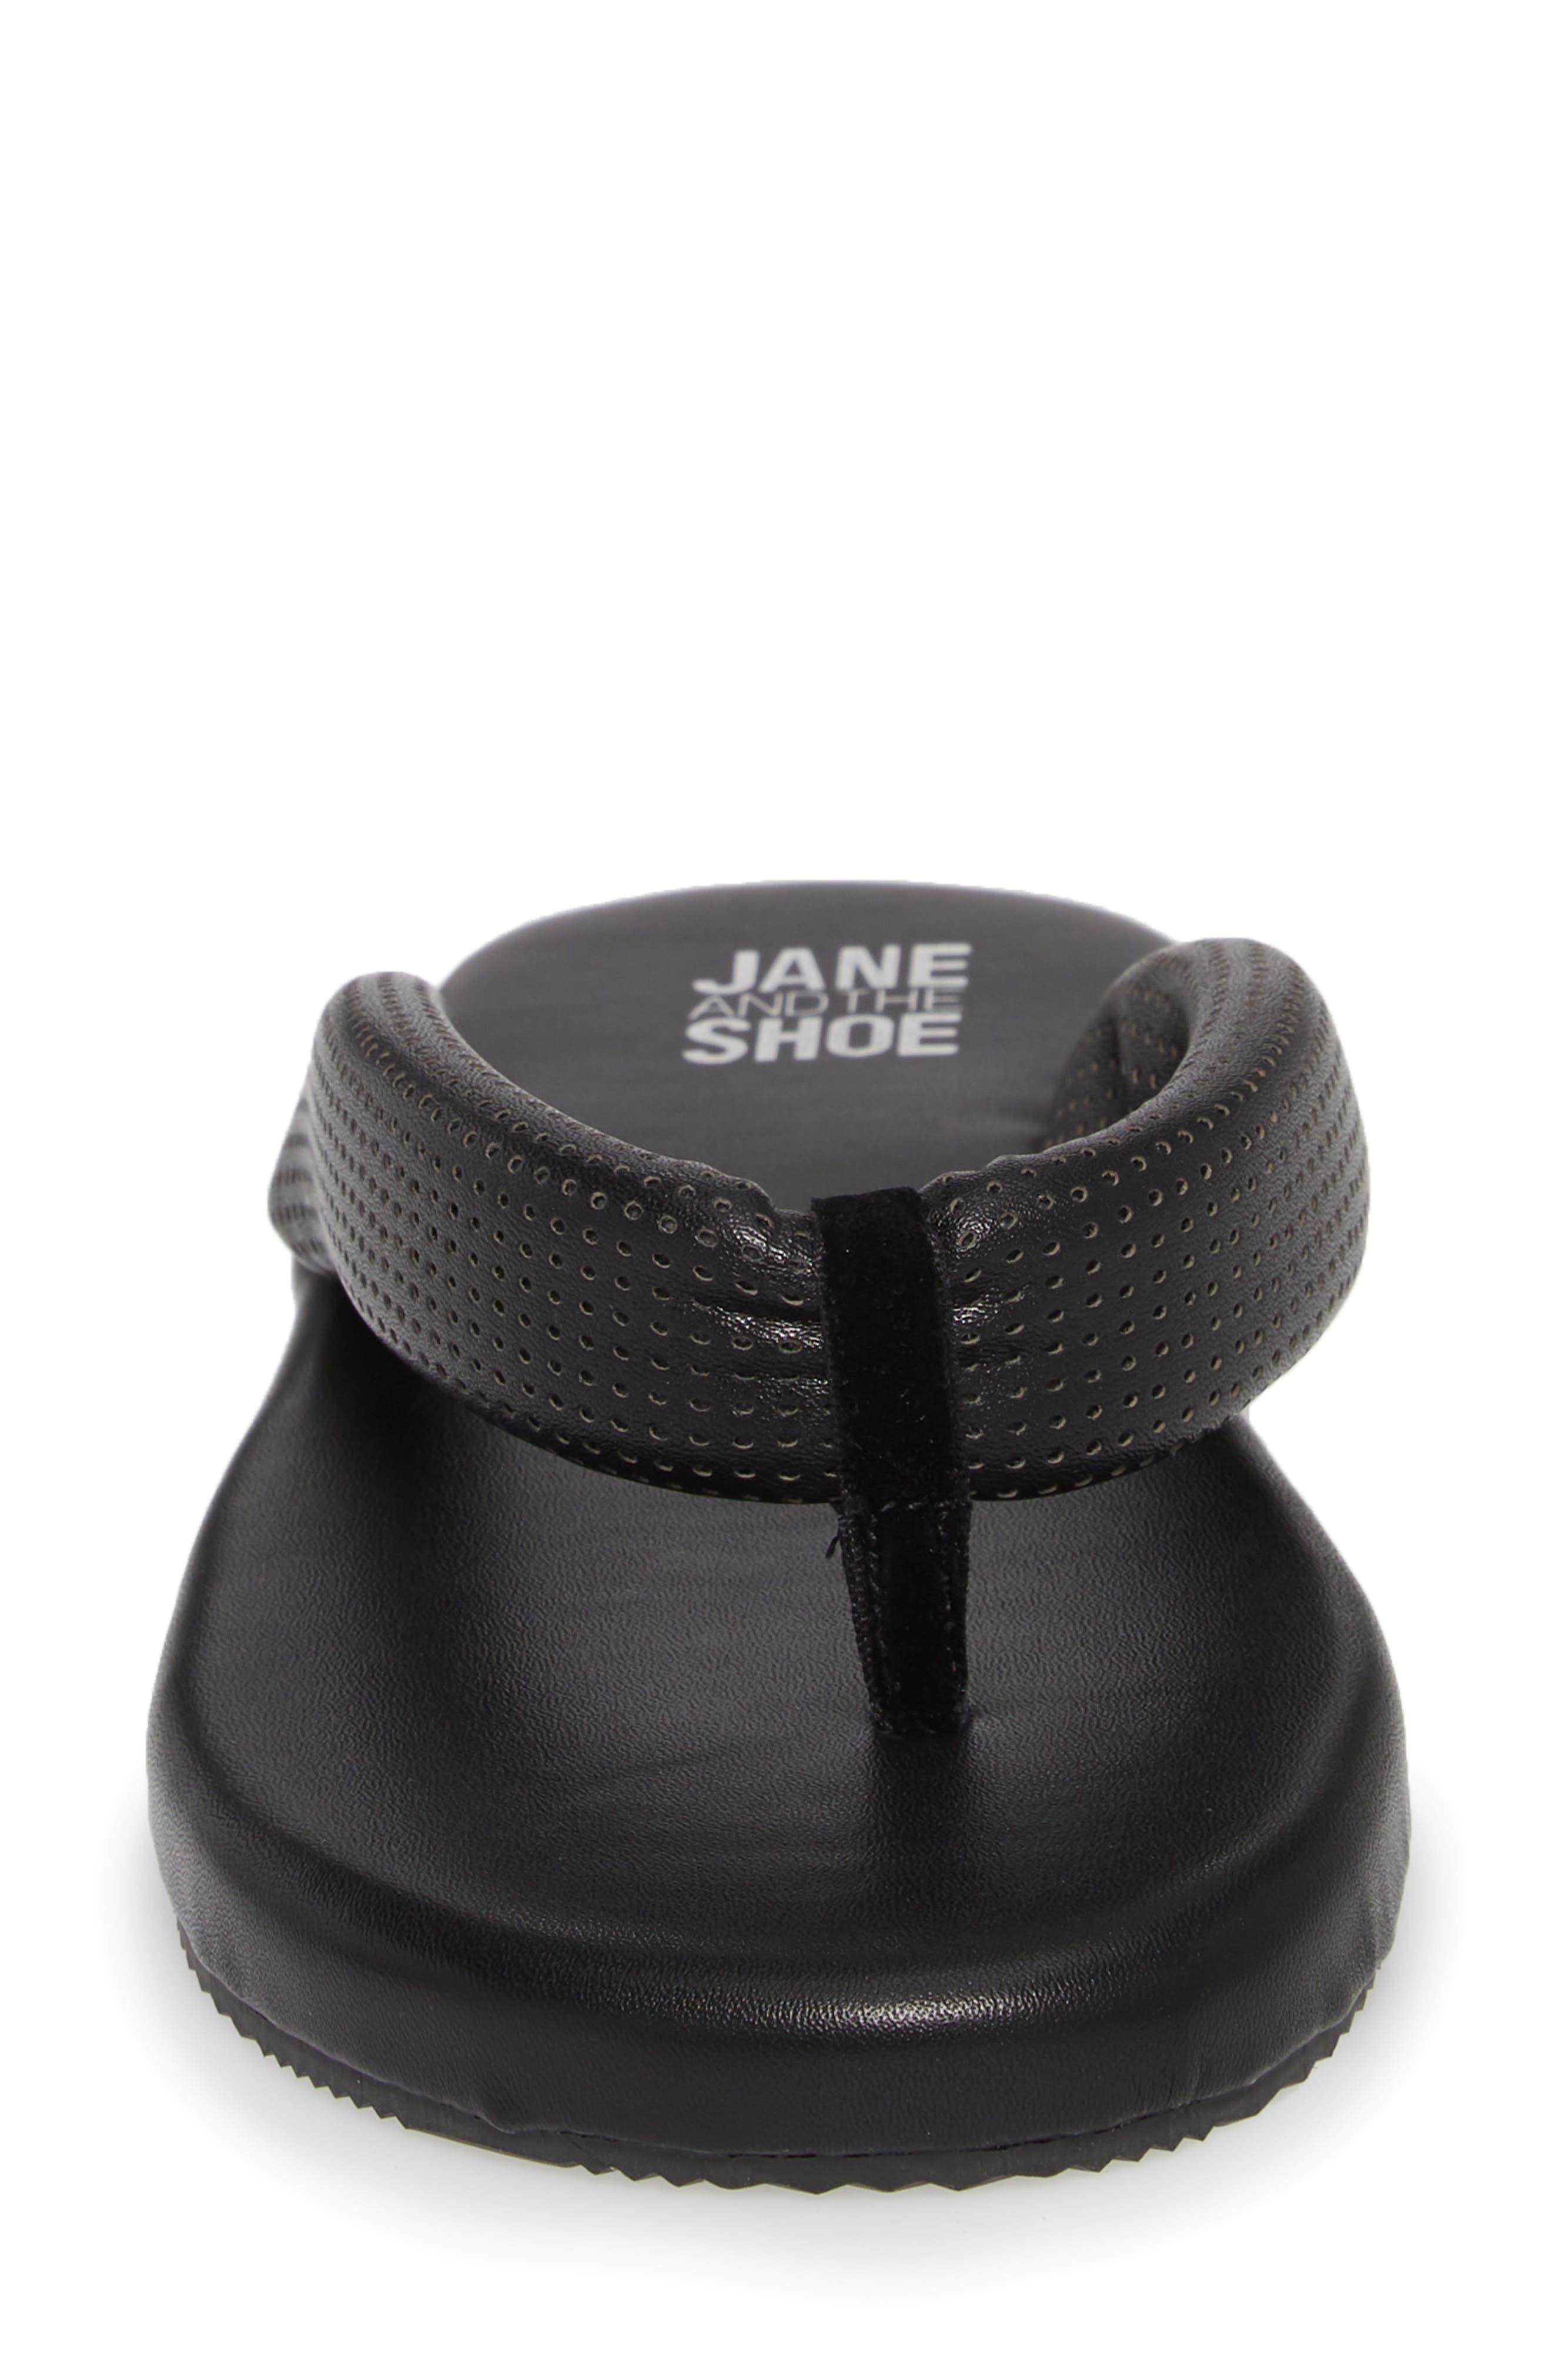 Jaime Plush Flip Flop,                             Alternate thumbnail 3, color,                             Black